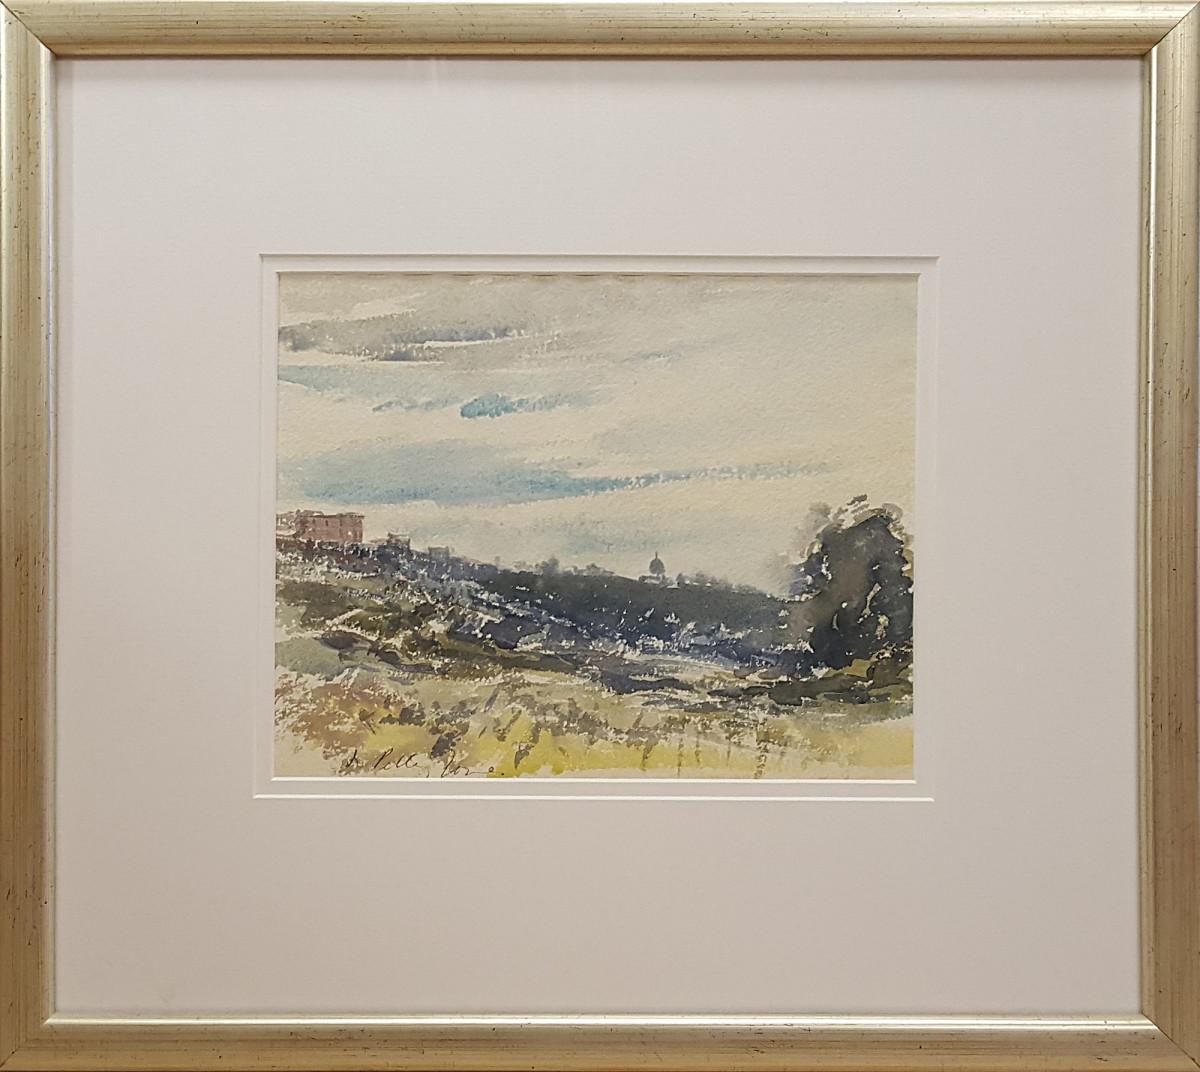 2351 - Edmonton 1929 by Llewellyn Petley-Jones (1908-1986)